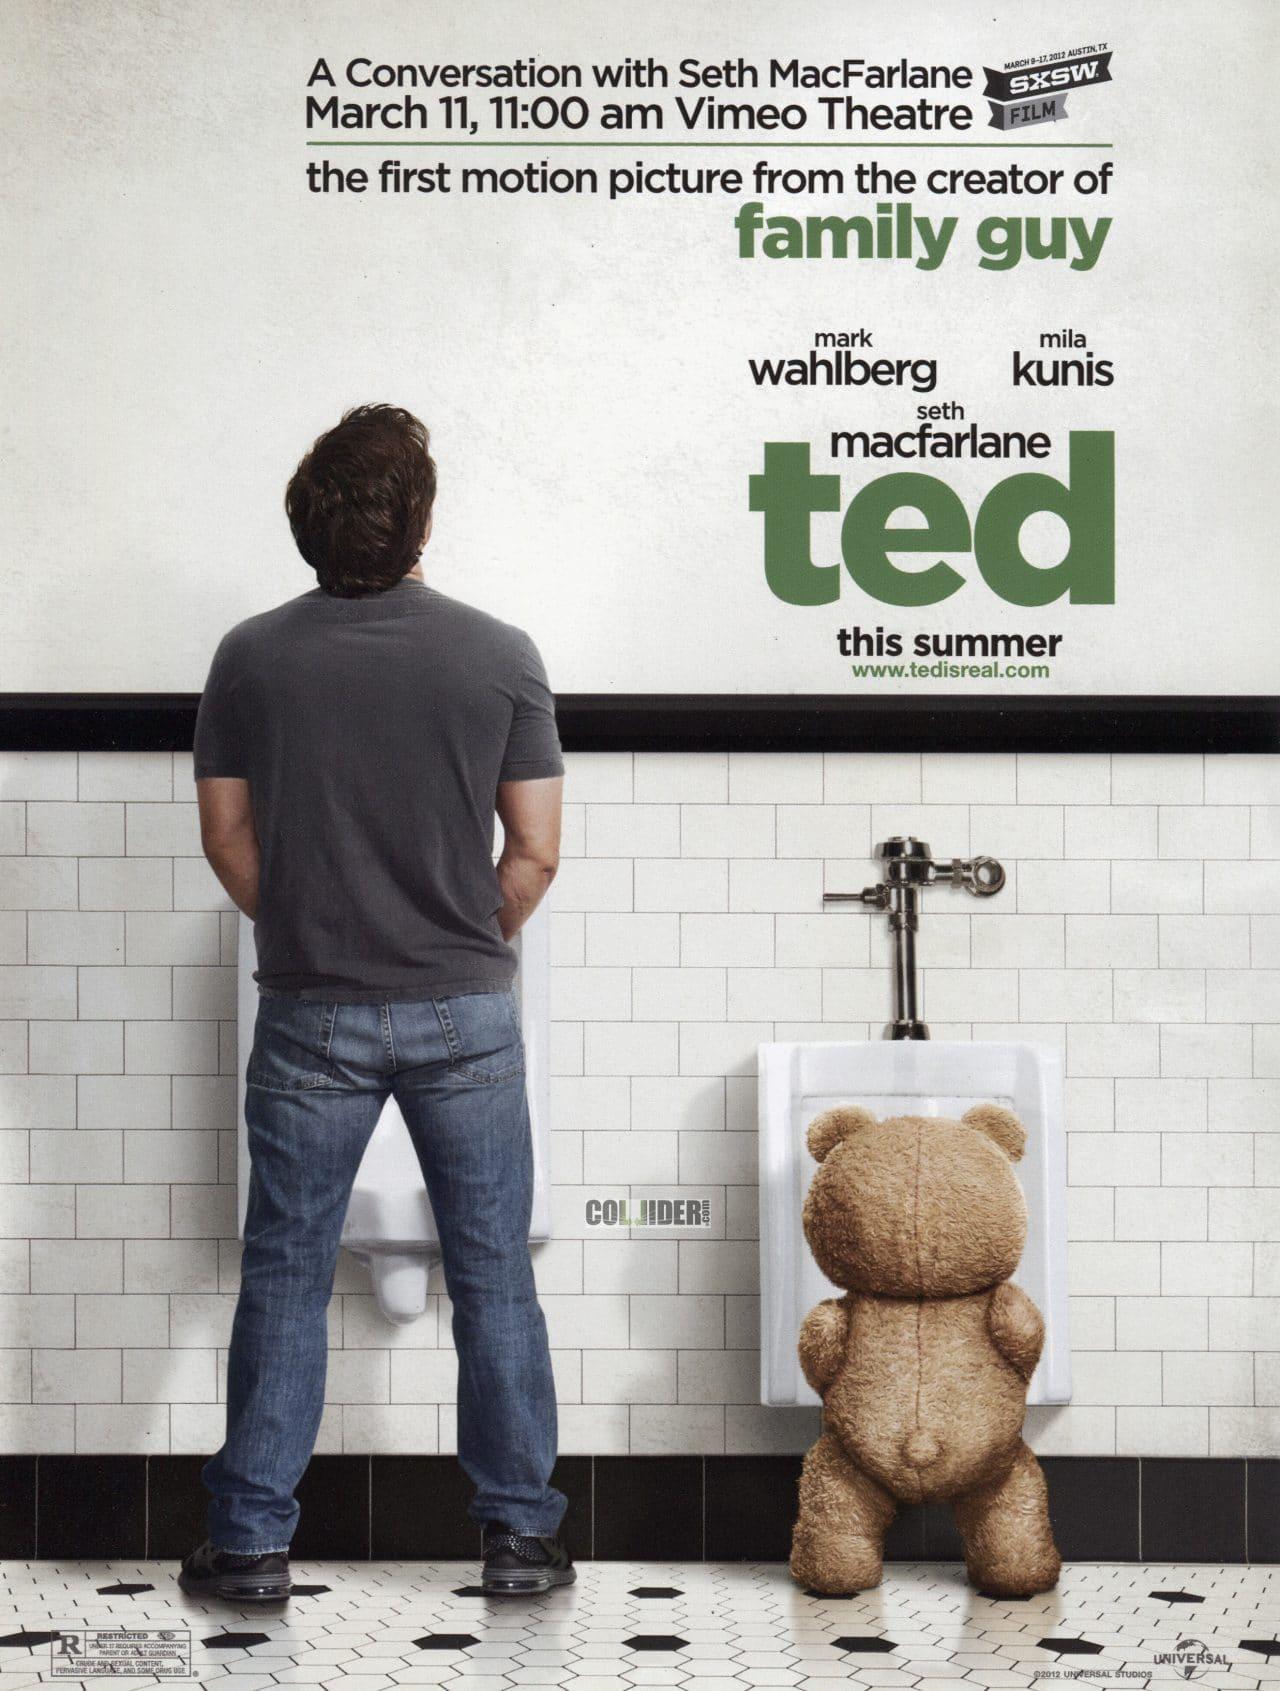 Ted avec Mark Wahlberg et Mila Kunis : La critique